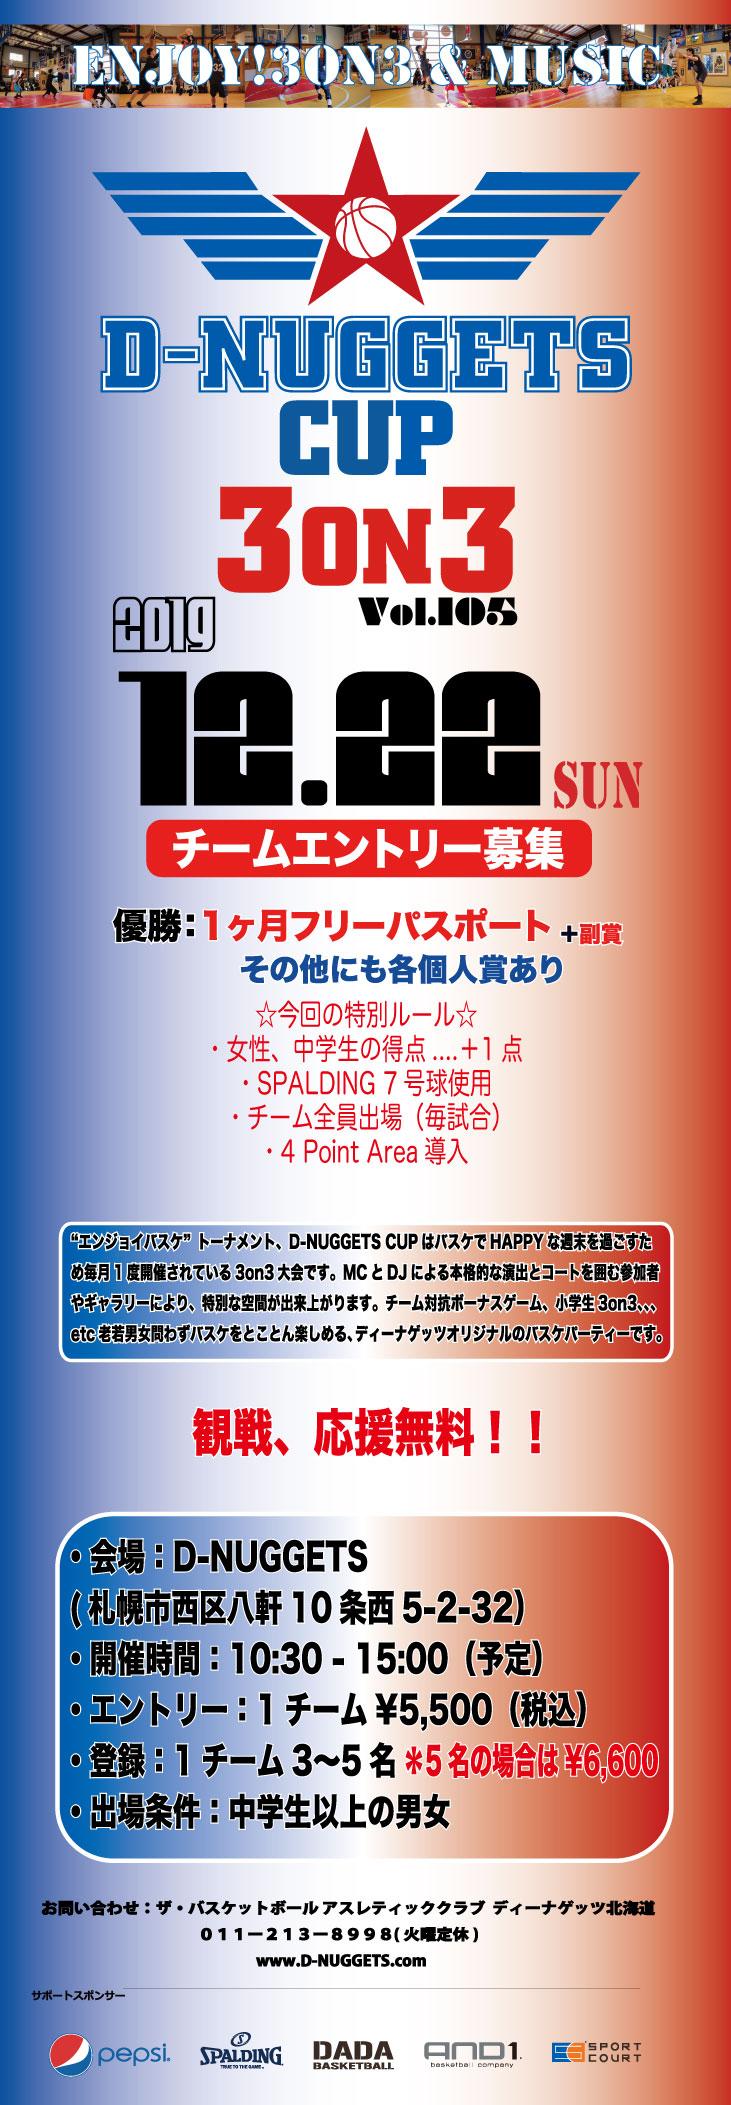 D-NUGGETS-CUP-HOKKAIDO-Vol.105.jpg